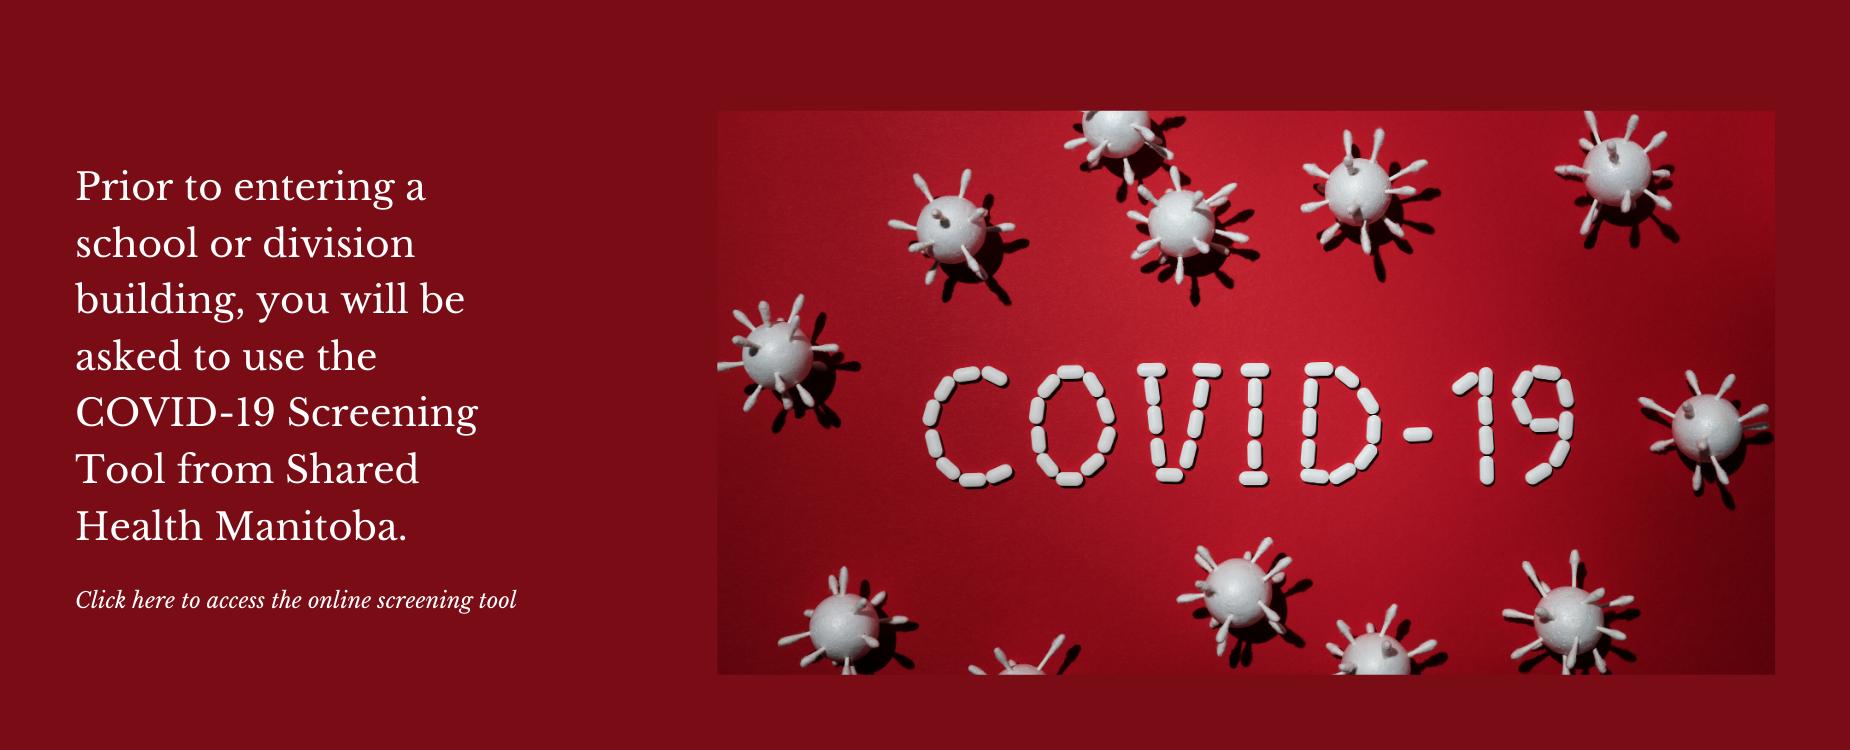 Shared Health screening tool - COVID-19